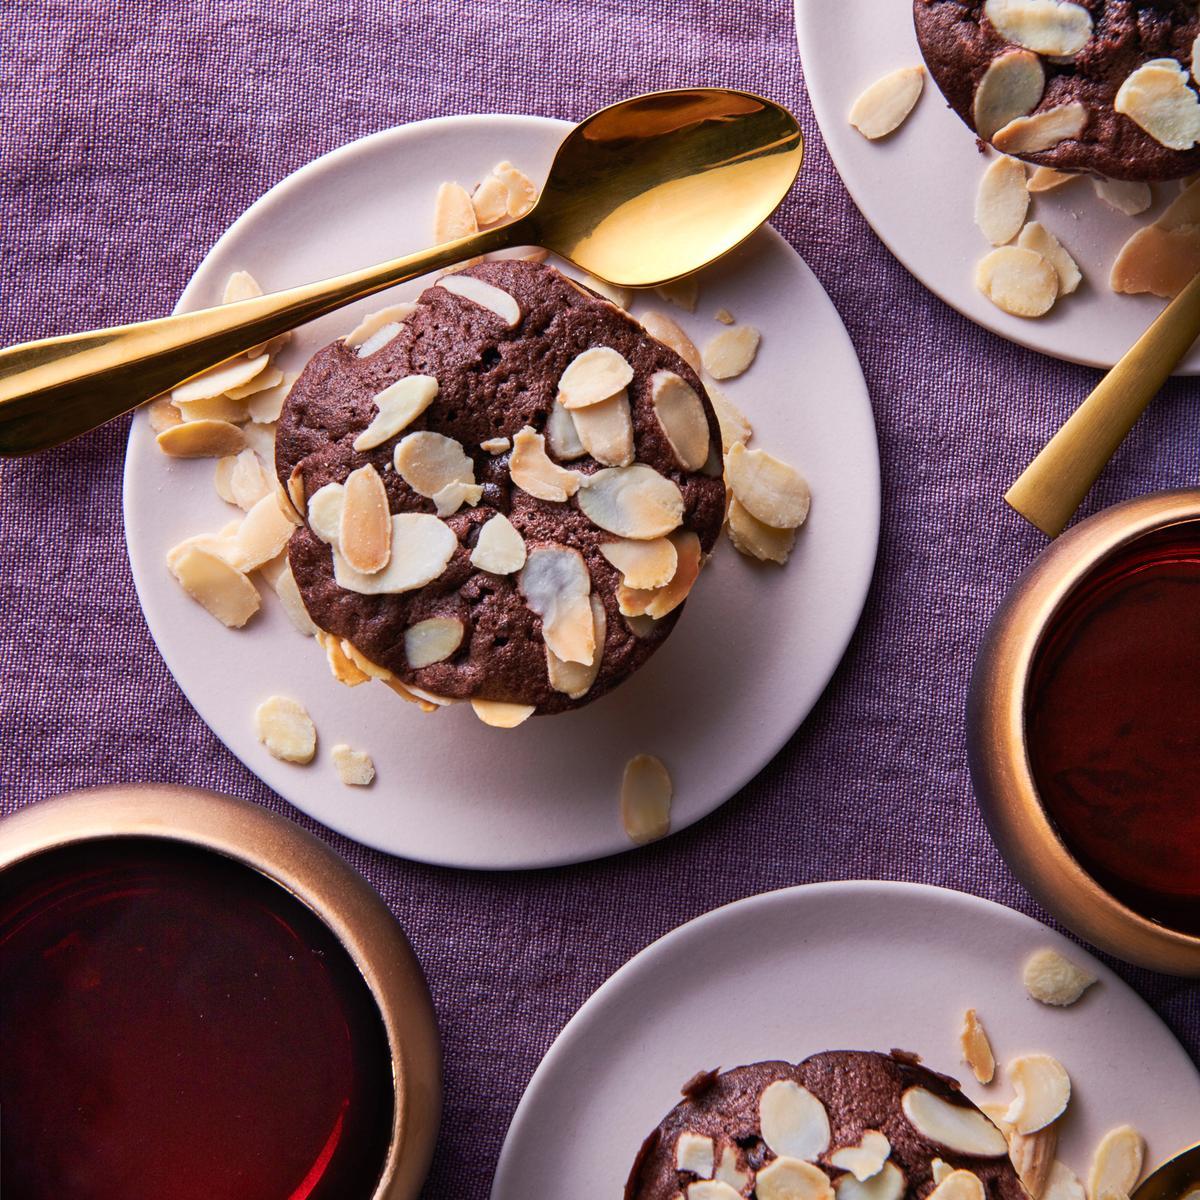 recette moelleux au chocolat cuisine madame figaro. Black Bedroom Furniture Sets. Home Design Ideas